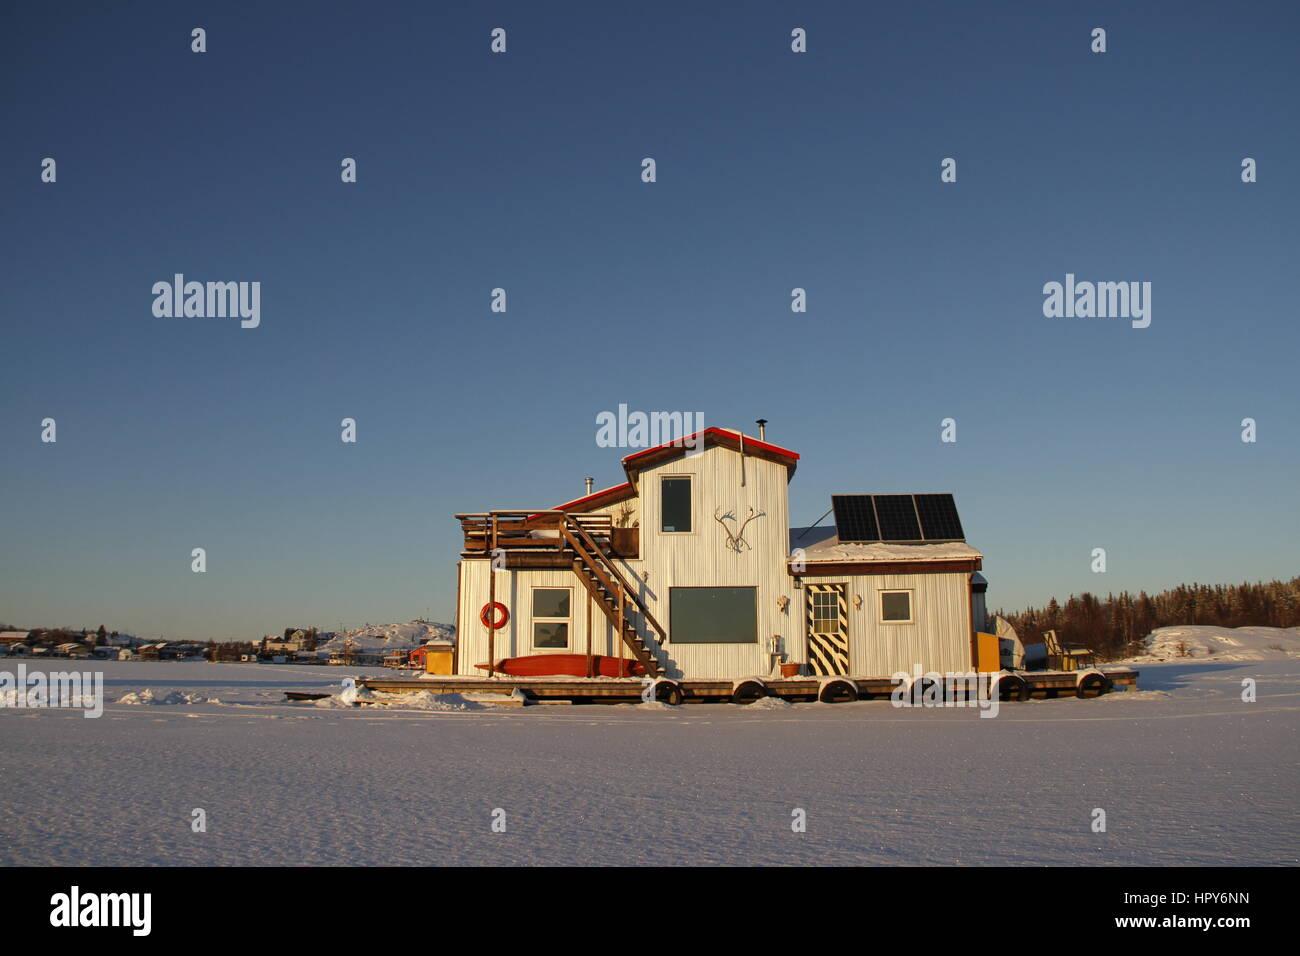 Beautiful white houseboat on Yellowknife Bay in Great Slave Lake, Yellowknife, Northwest Territories - Stock Image